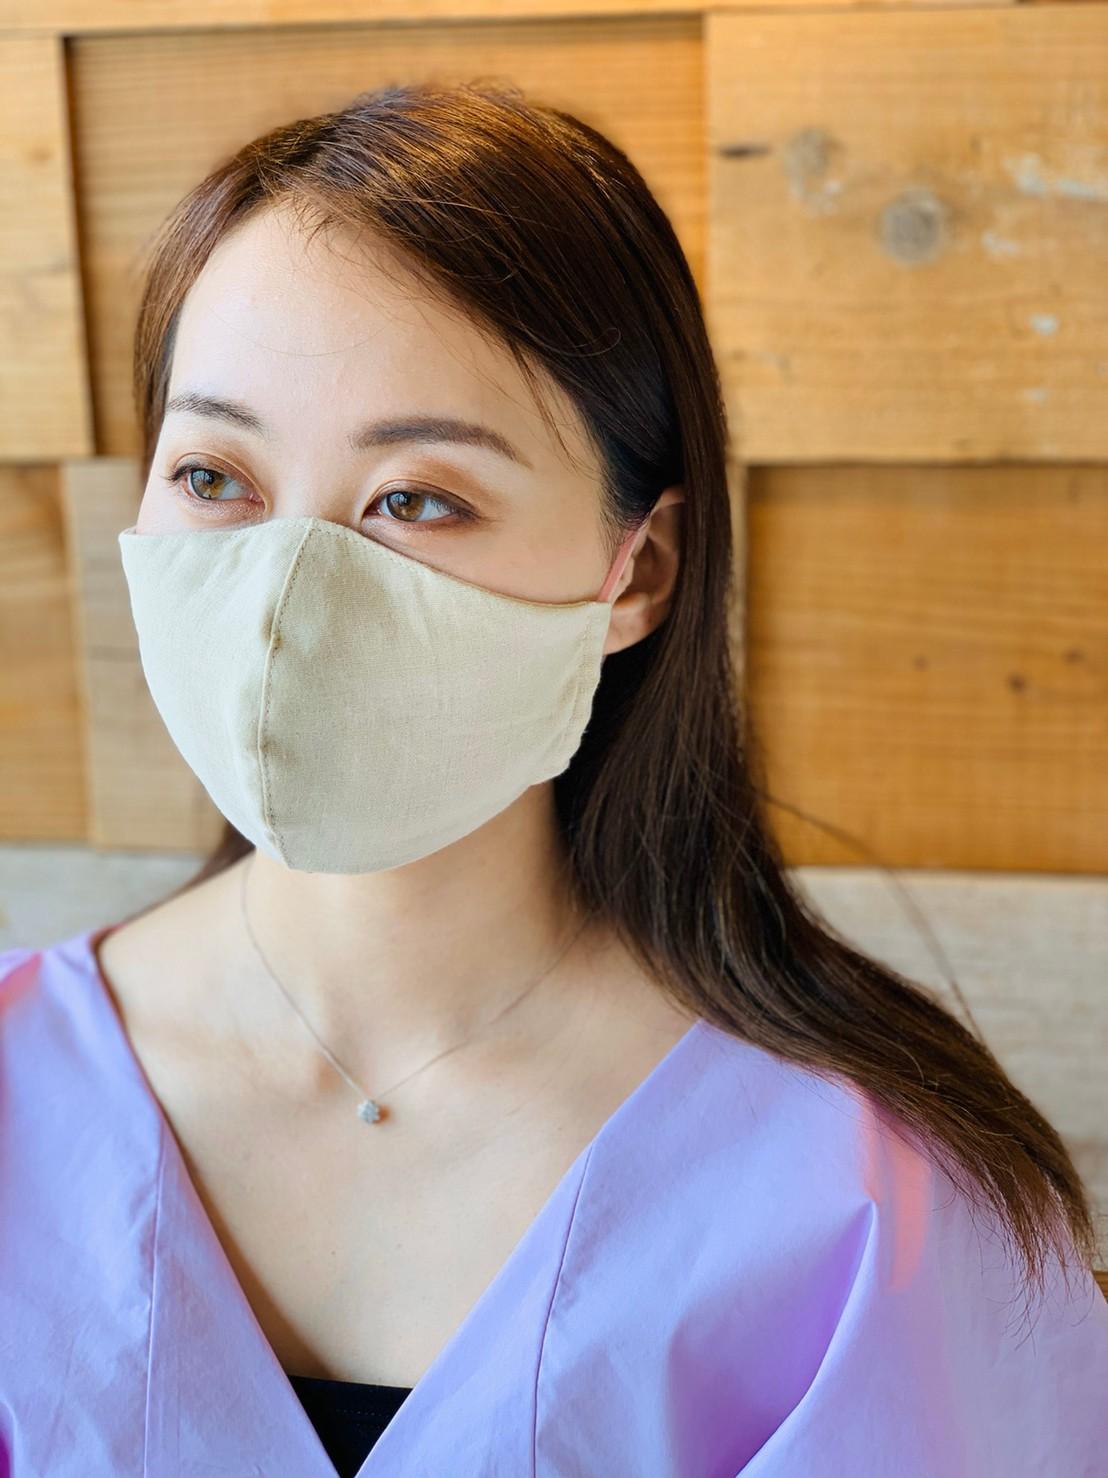 【Lサイズ】国産オーガニックダブルガーゼ不織布フィルターポケット付き立体マスク(ノーズワイヤーなし)ベージュLサイズ画像